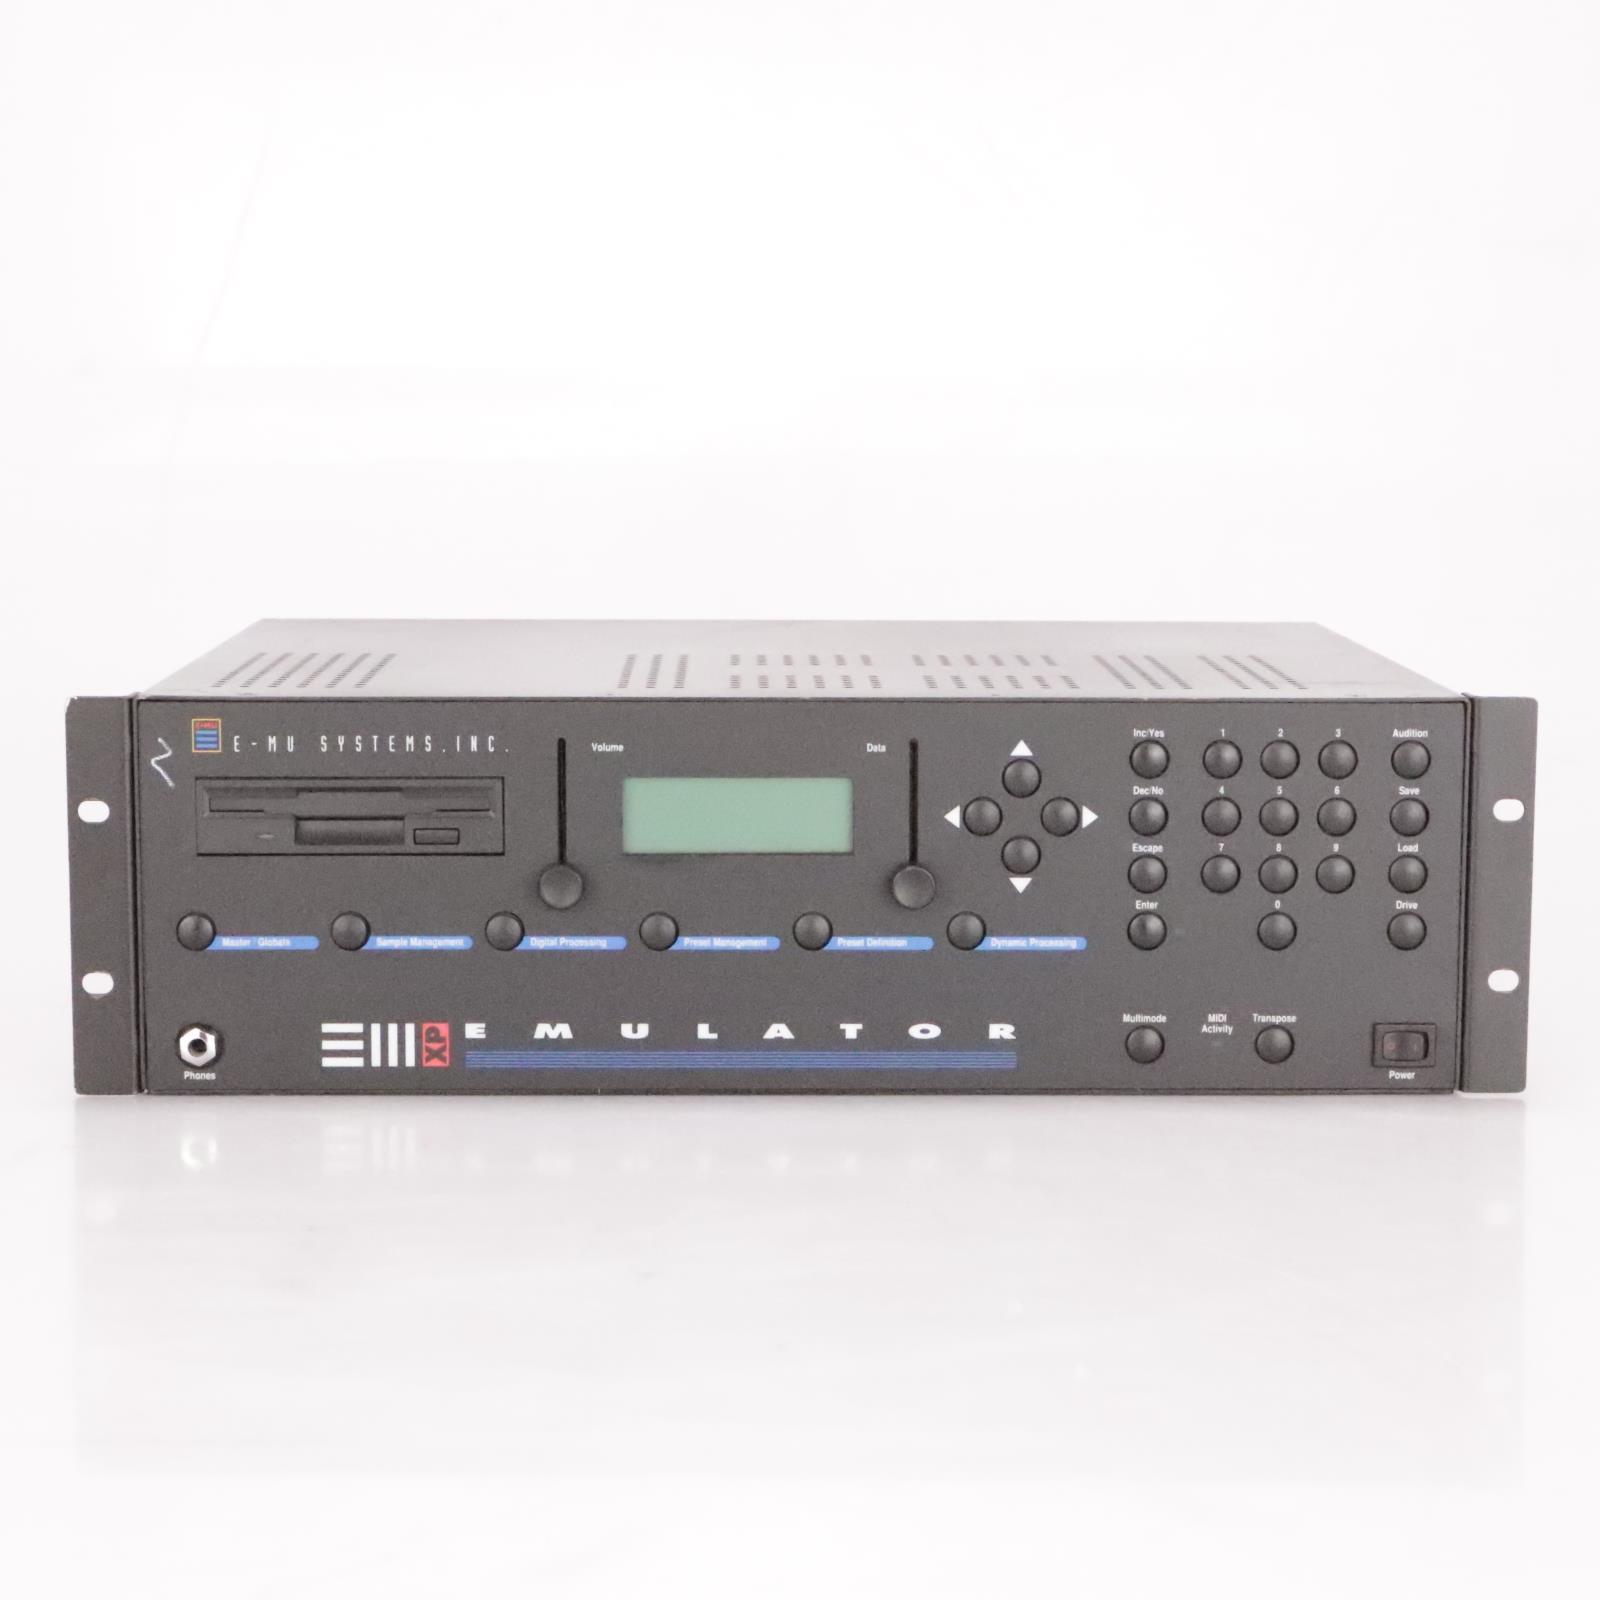 E-Mu EIIIxp Emulator 6100 Rack Sampler E3XP EIII XP III 3 #36872